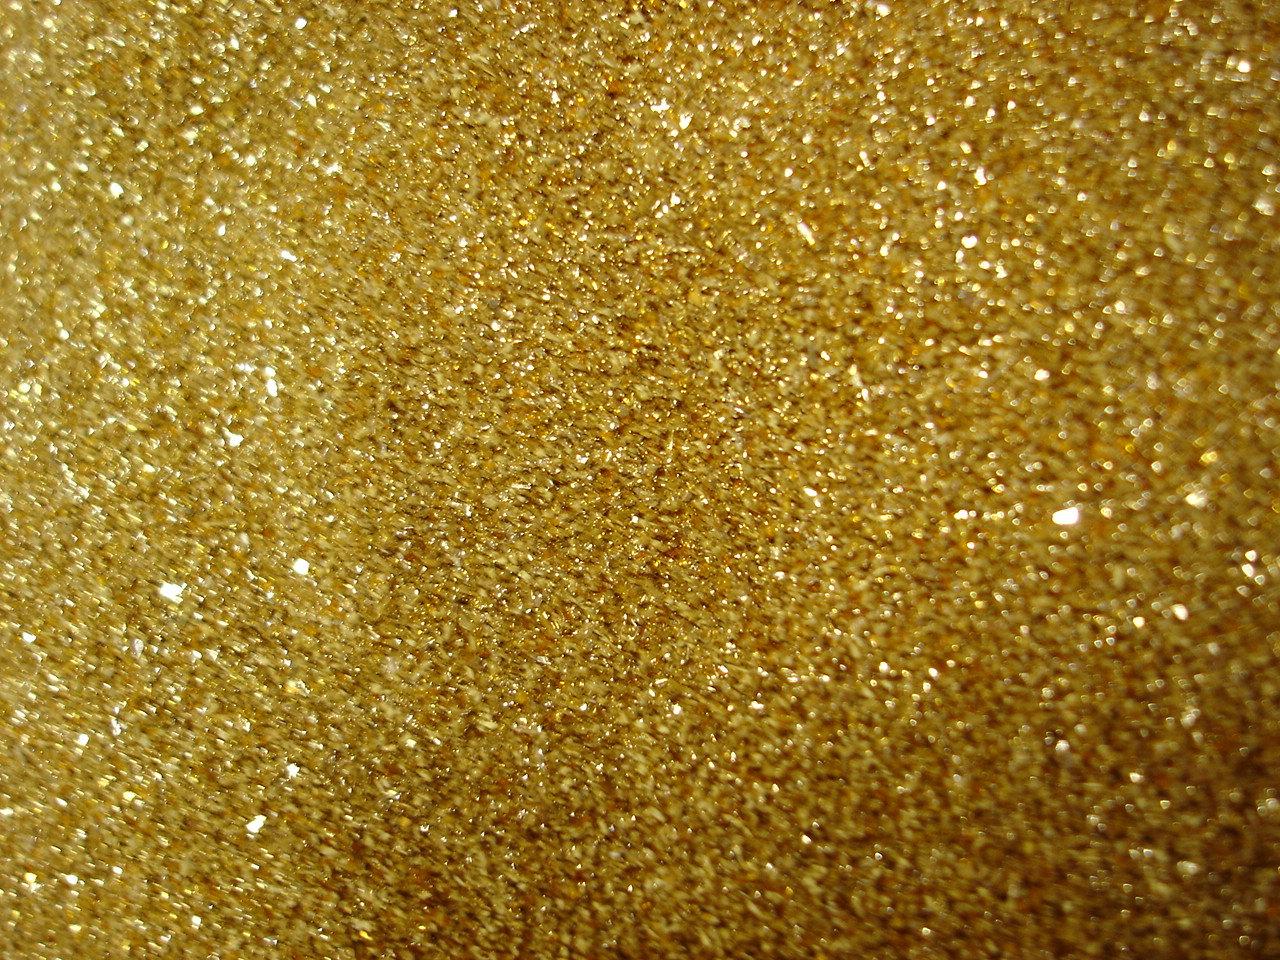 Go Back Images For Gold Glitter 1280x960